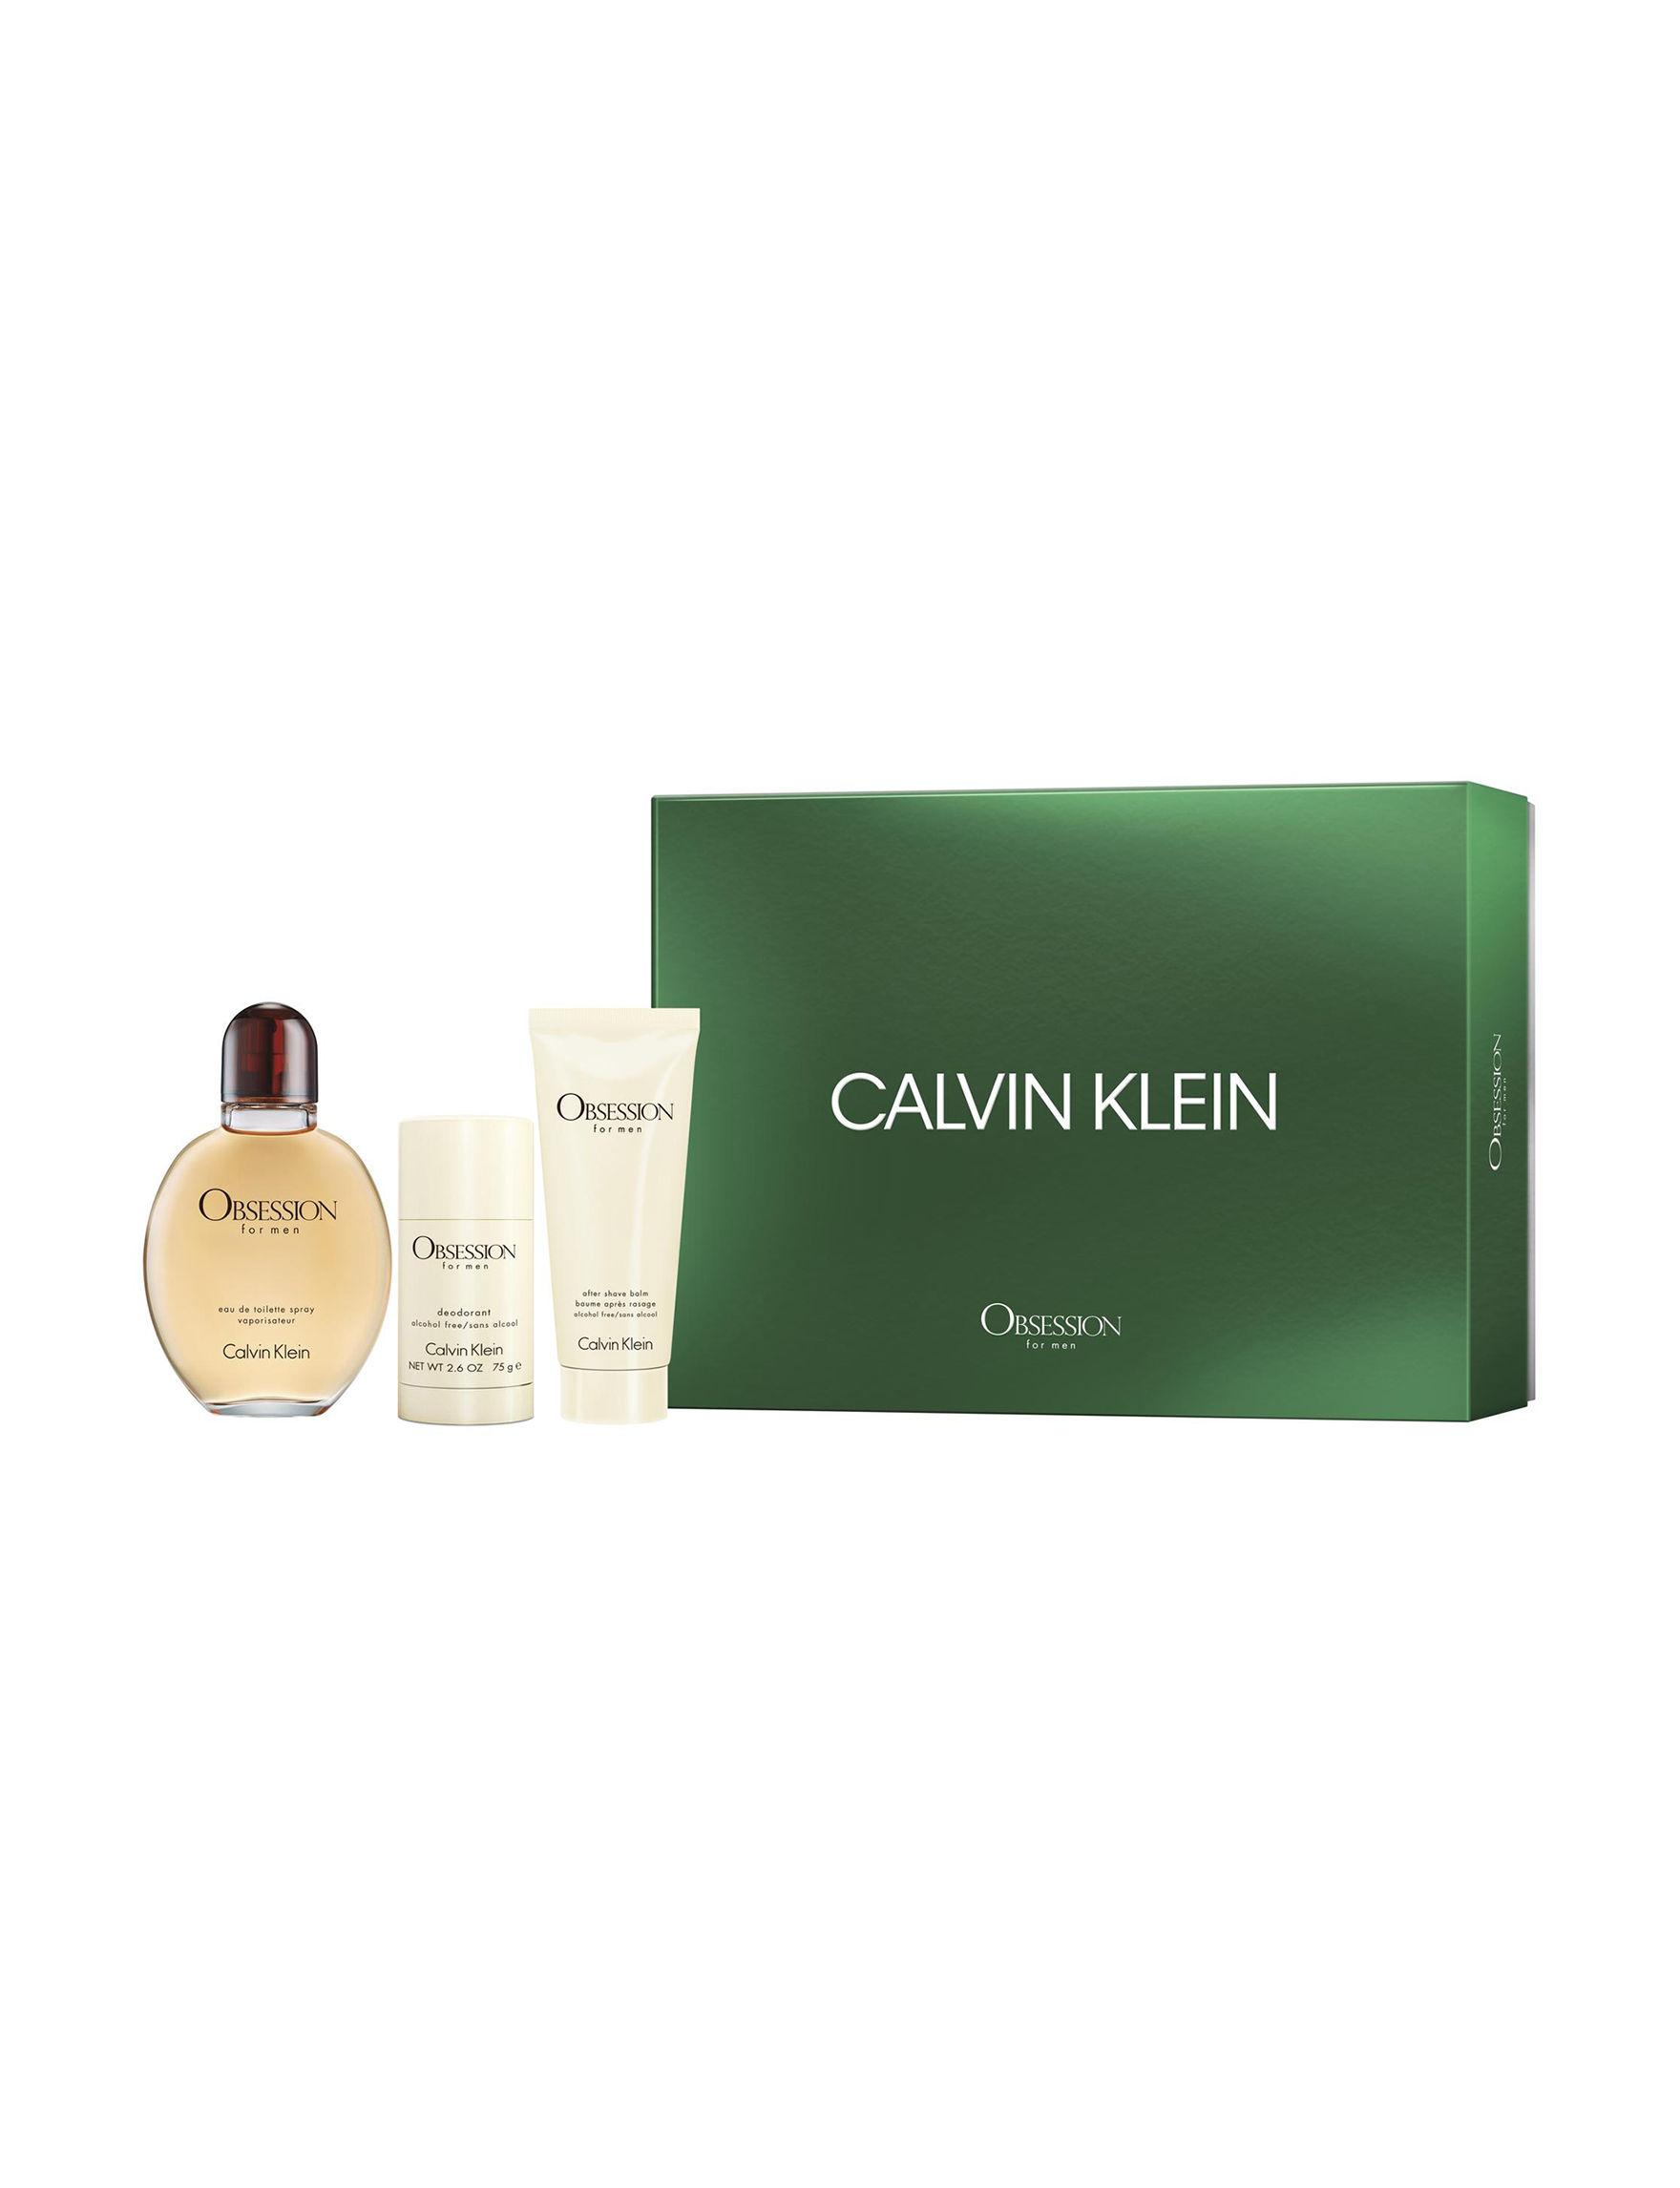 Calvin Klein  Fragrance Gift Sets